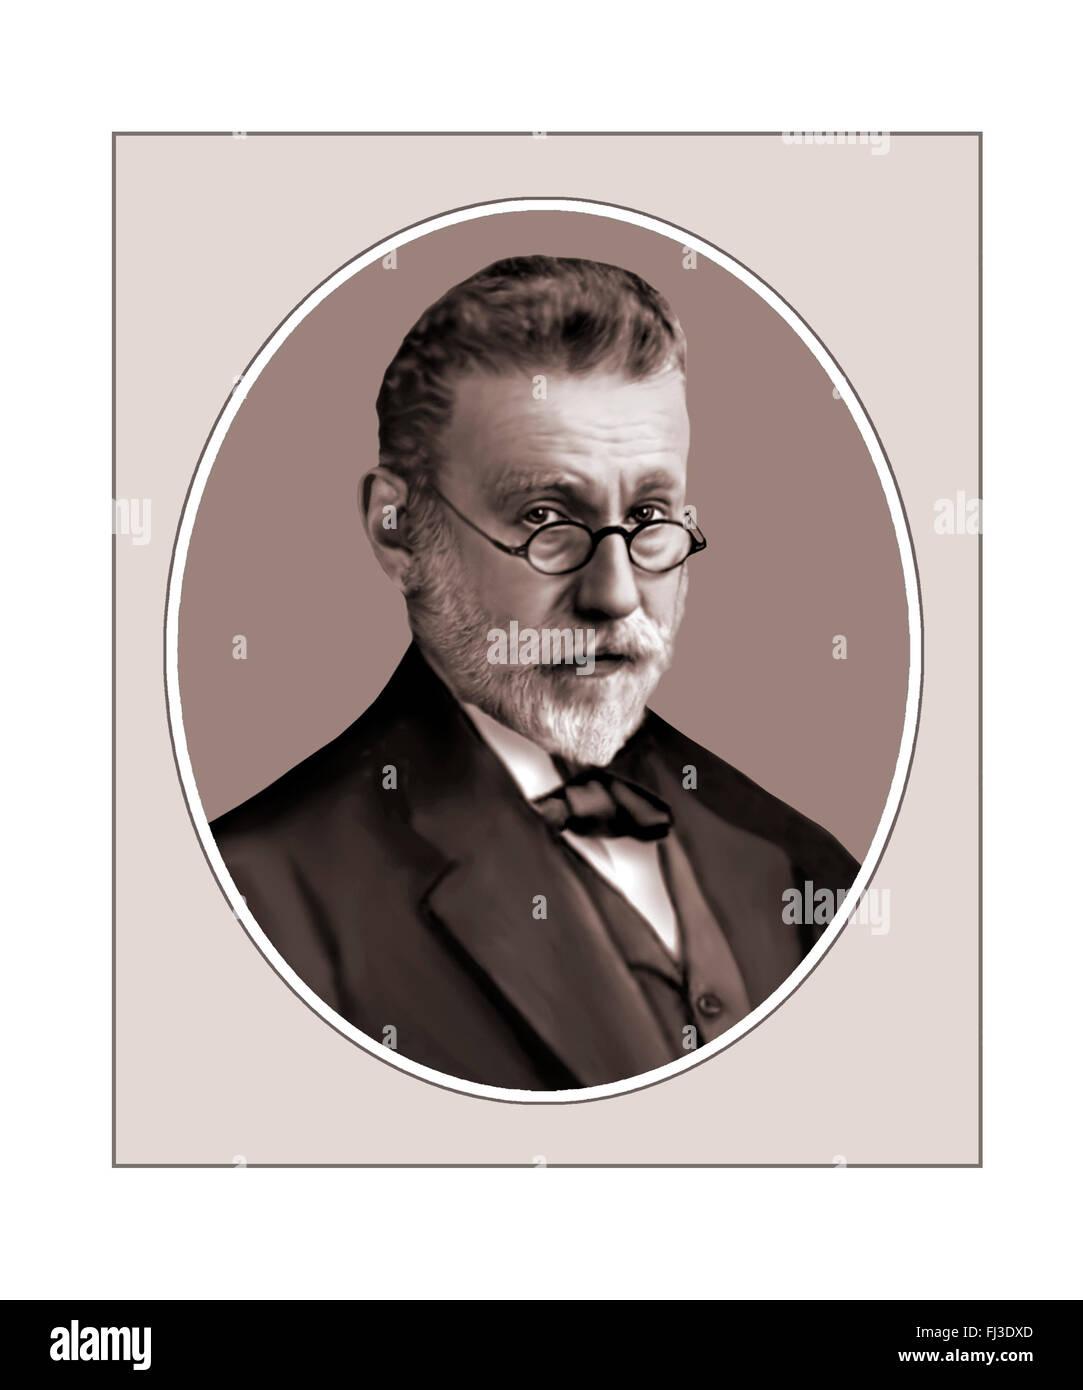 Paul Ehrlich, Bacteriologist, Portrait - Stock Image